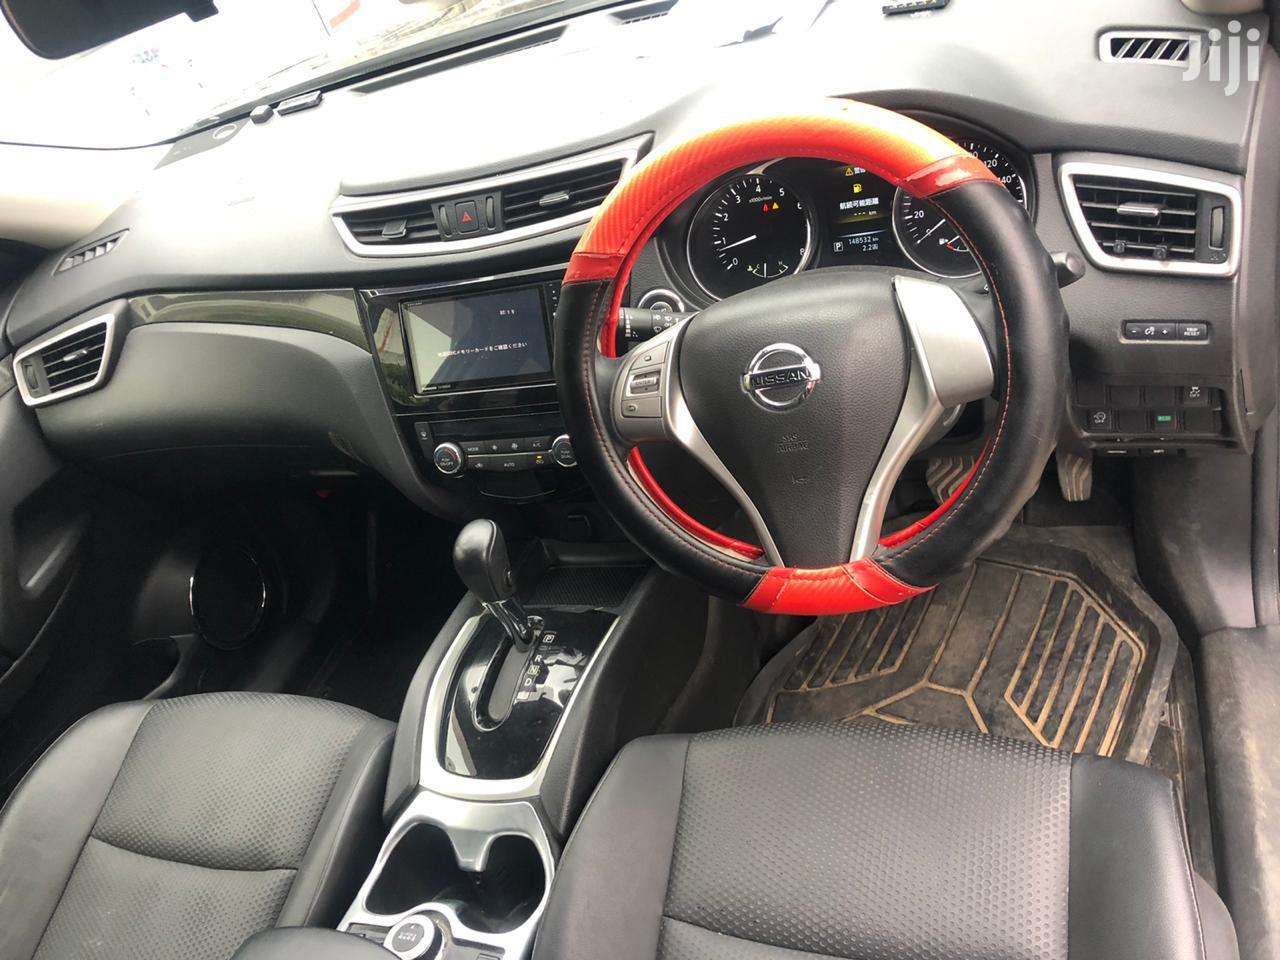 New Nissan X-Trail 2014 Black | Cars for sale in Nairobi Central, Nairobi, Kenya